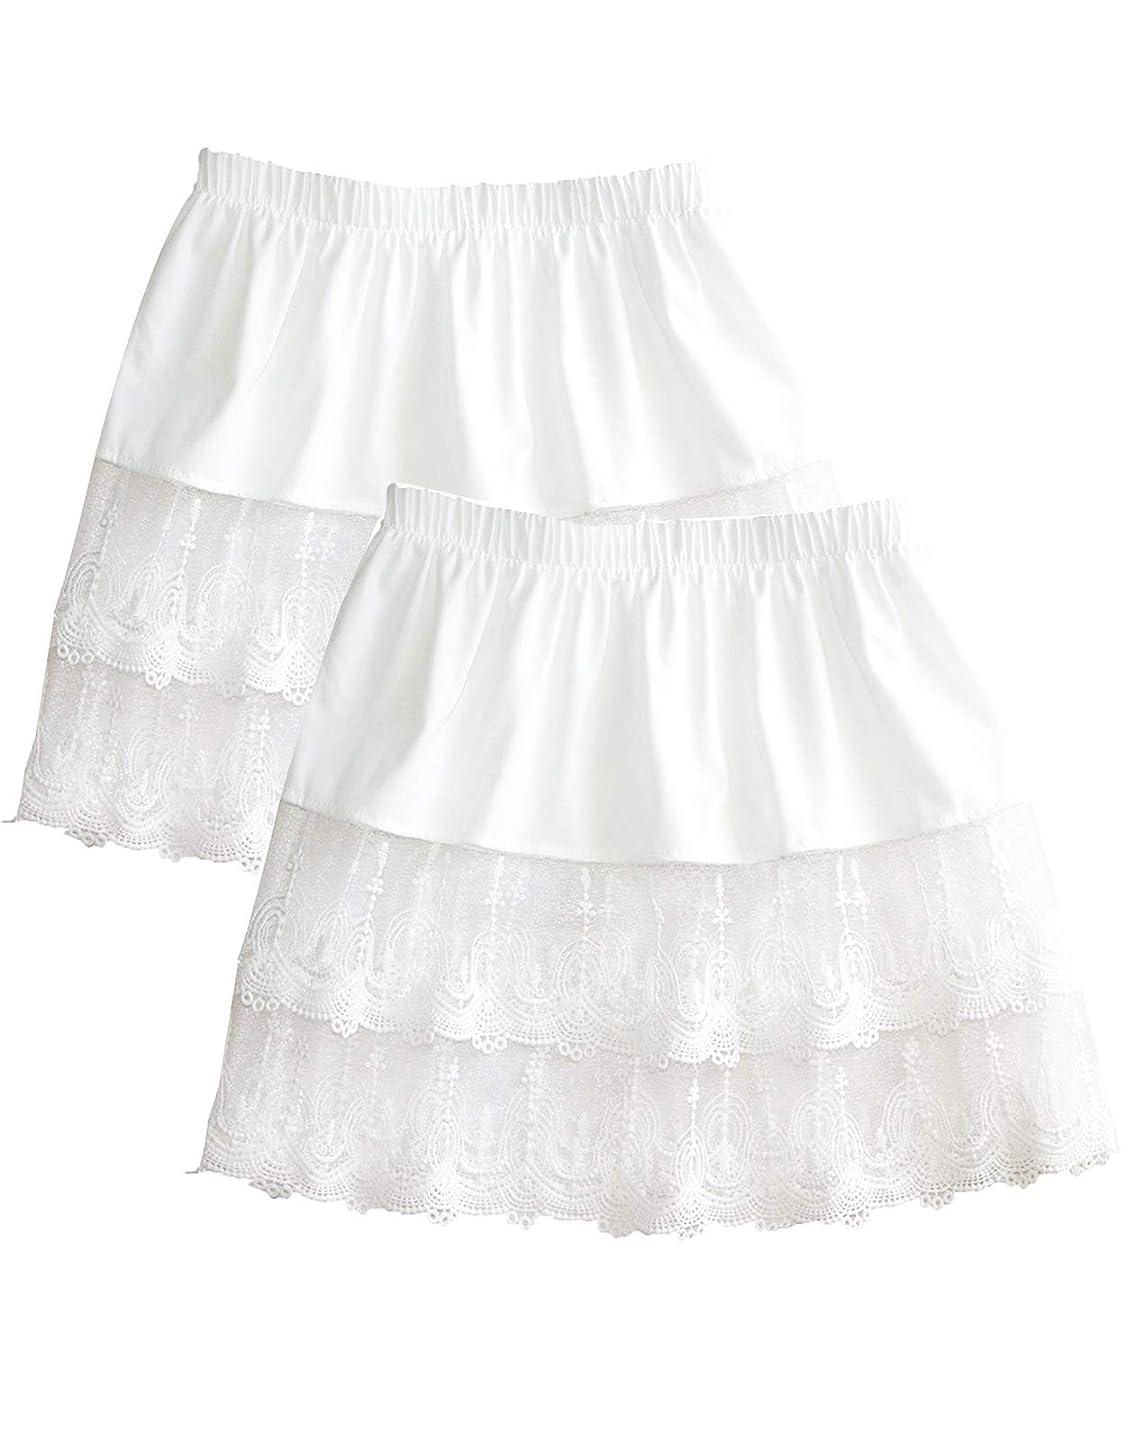 Women's Lace Extender Mini Lace Skirts Half Slip Extra Length Plus Size